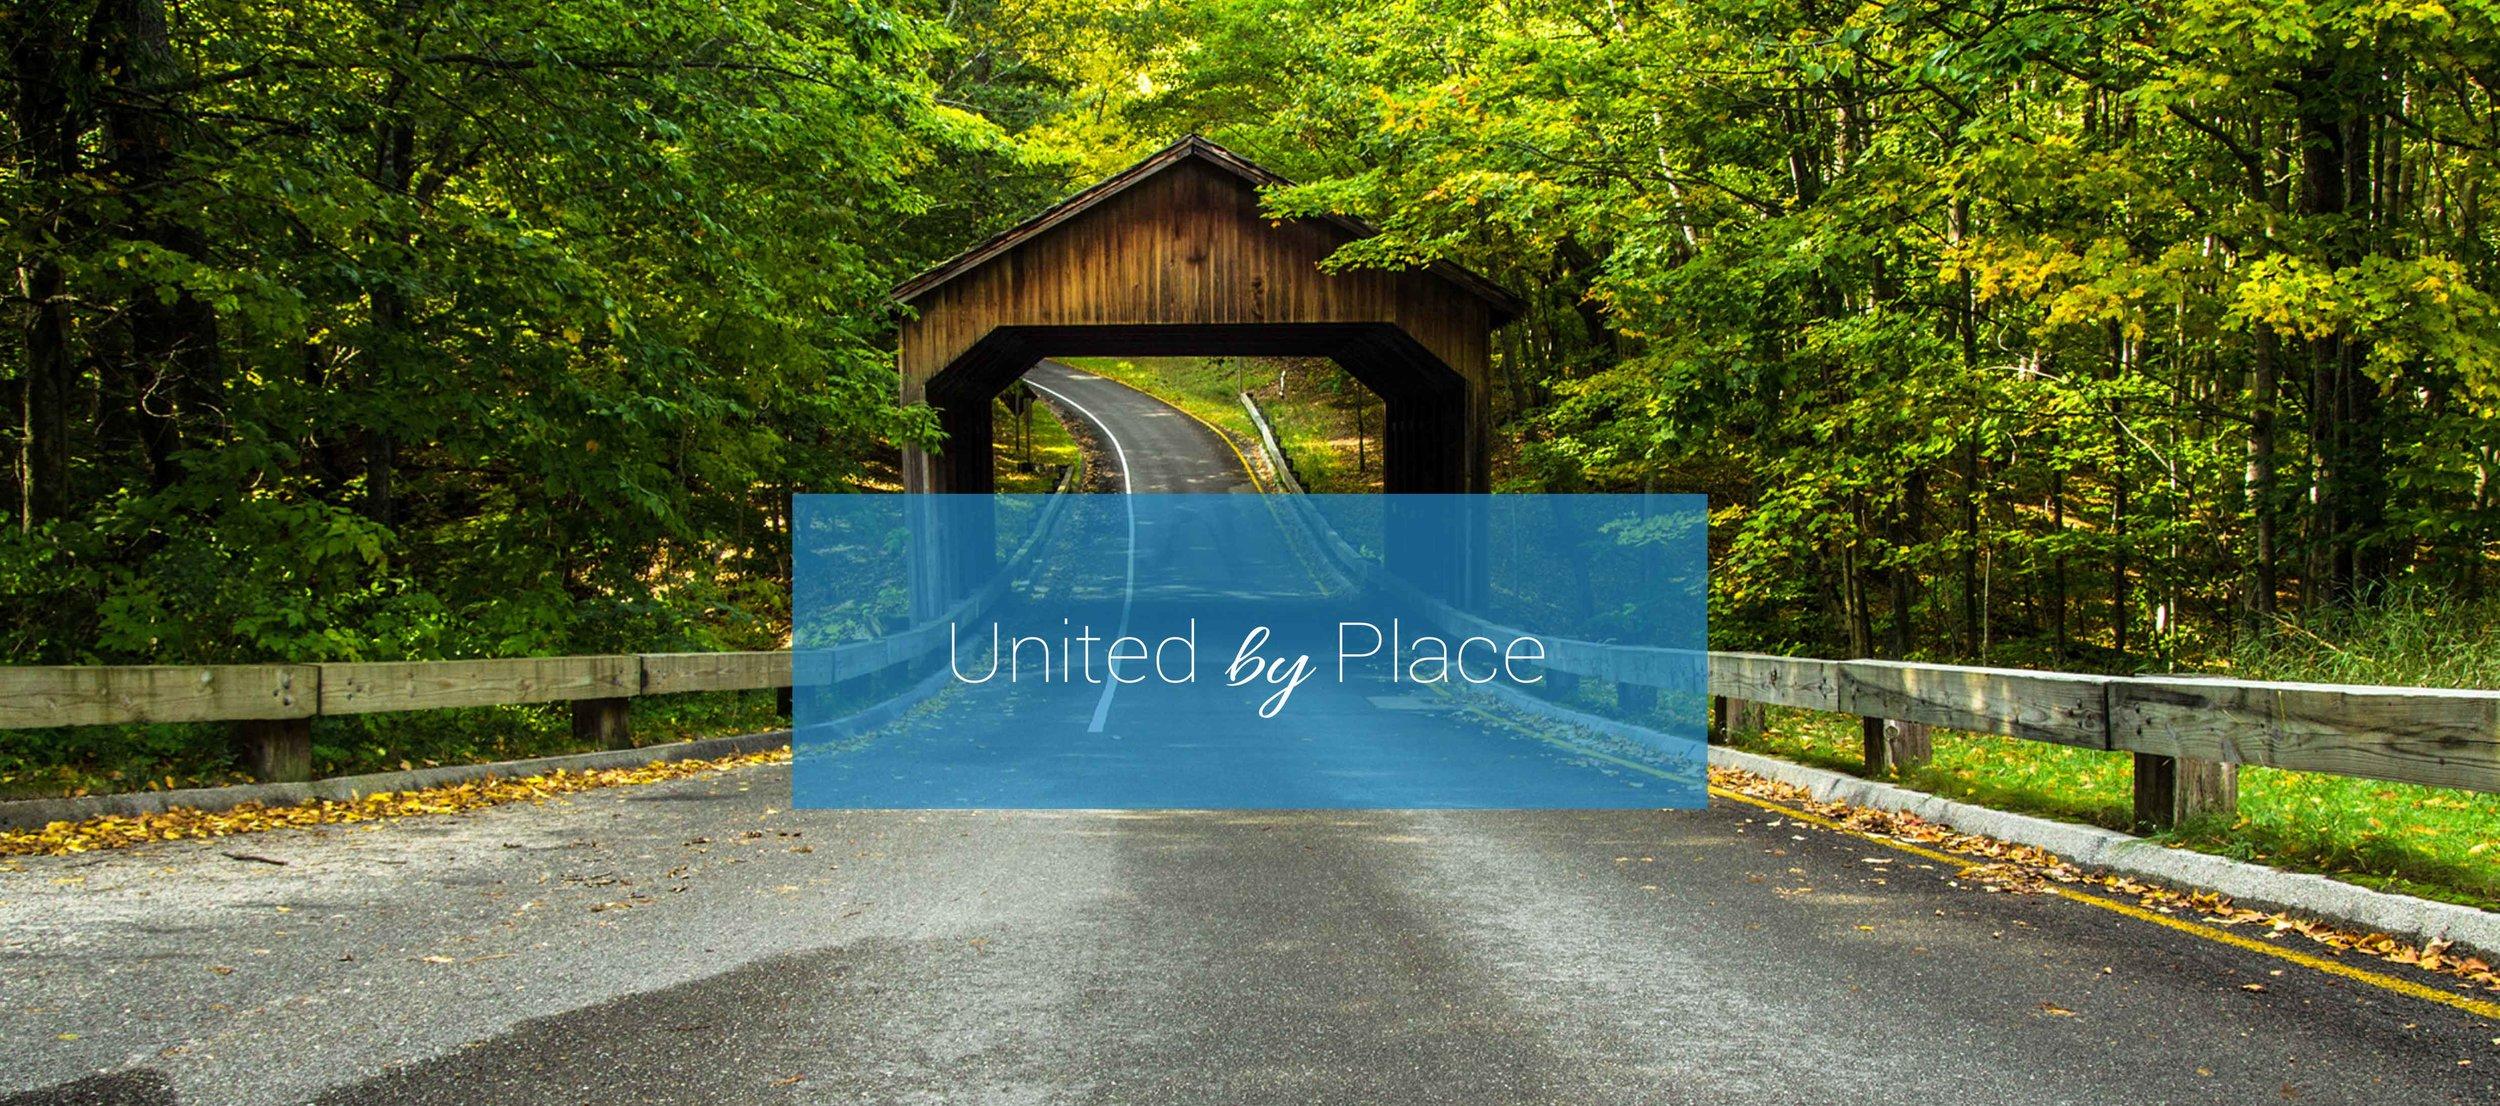 2018-ParkerHarvey-unitedbyplace.jpg